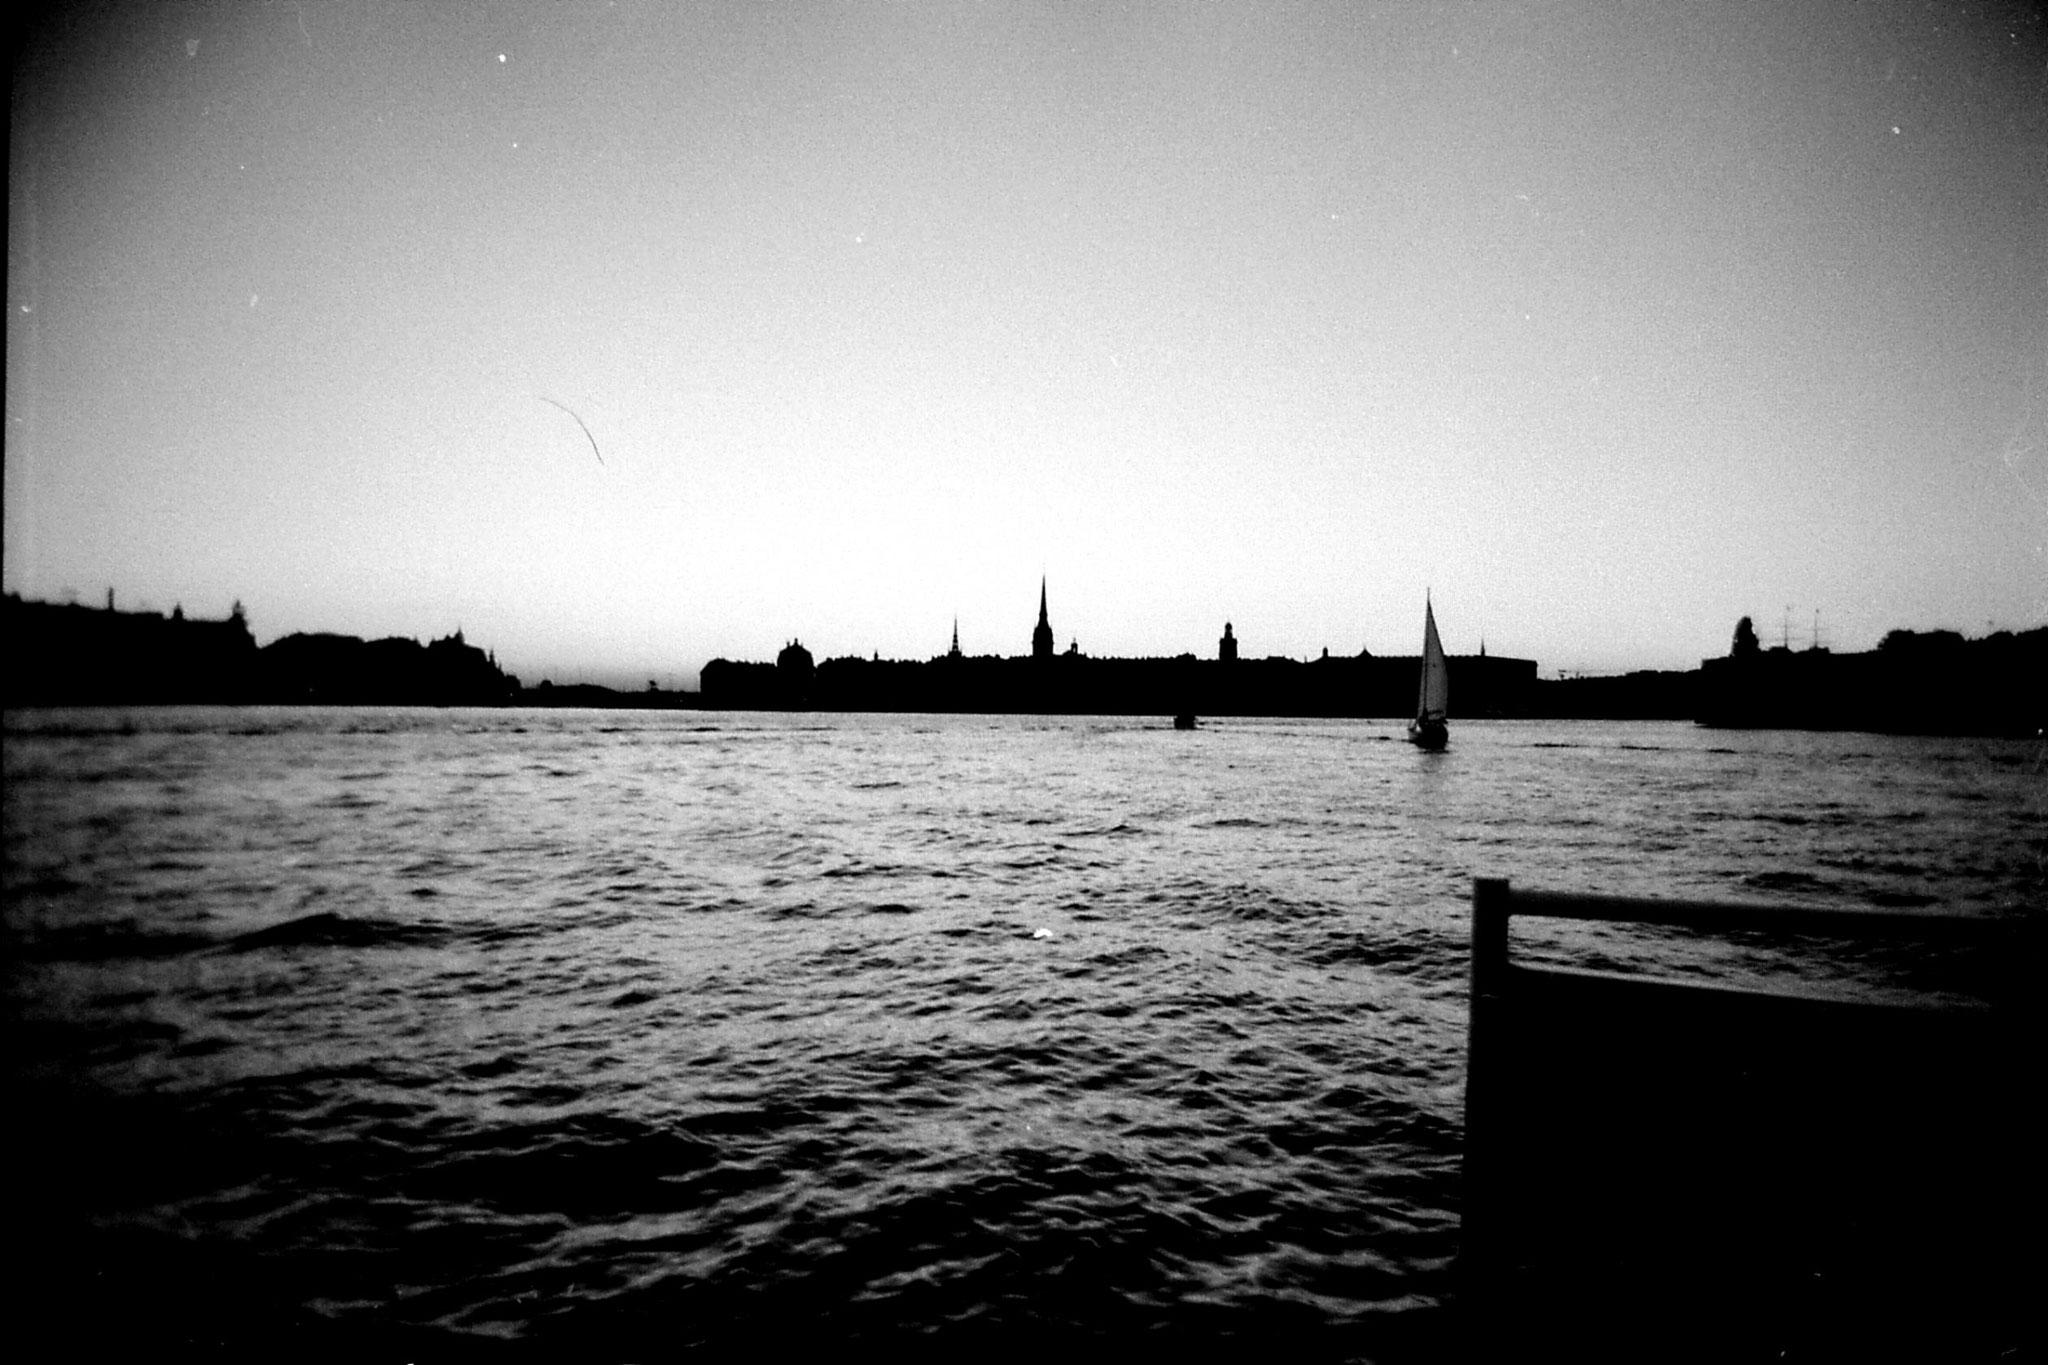 8/9/1988: 2: Stockholm